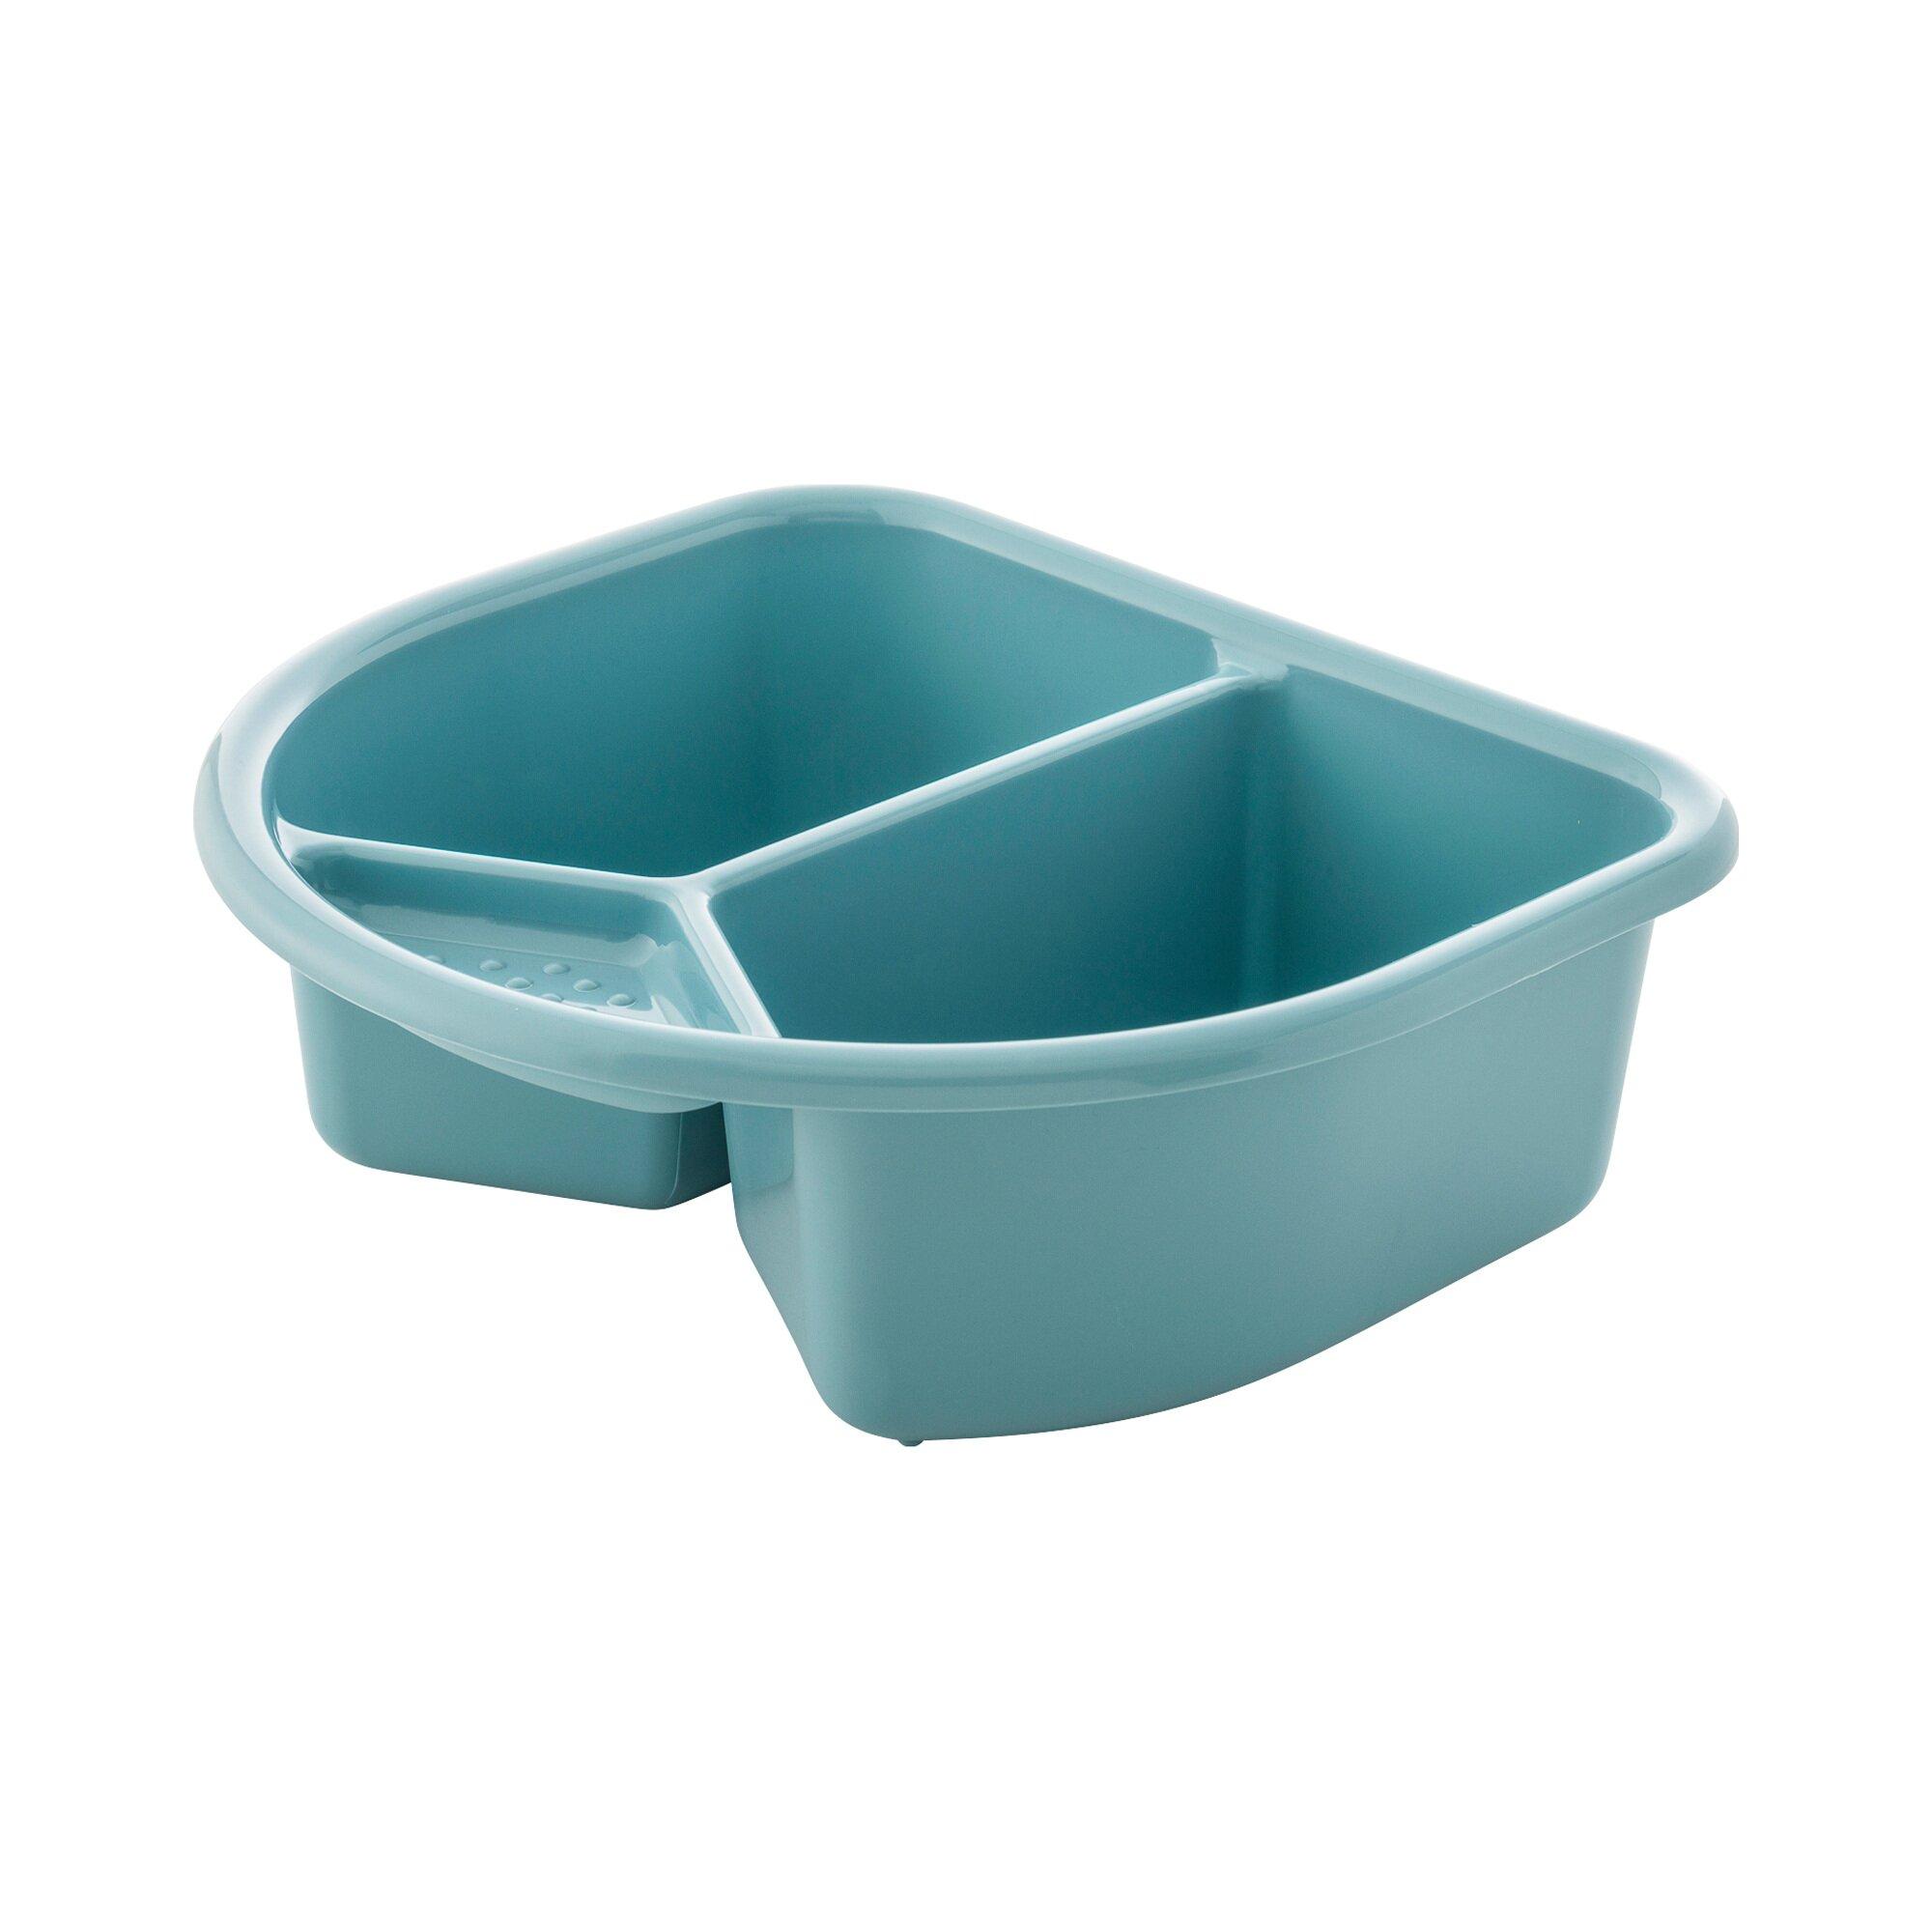 rotho-babydesign-waschschussel-top